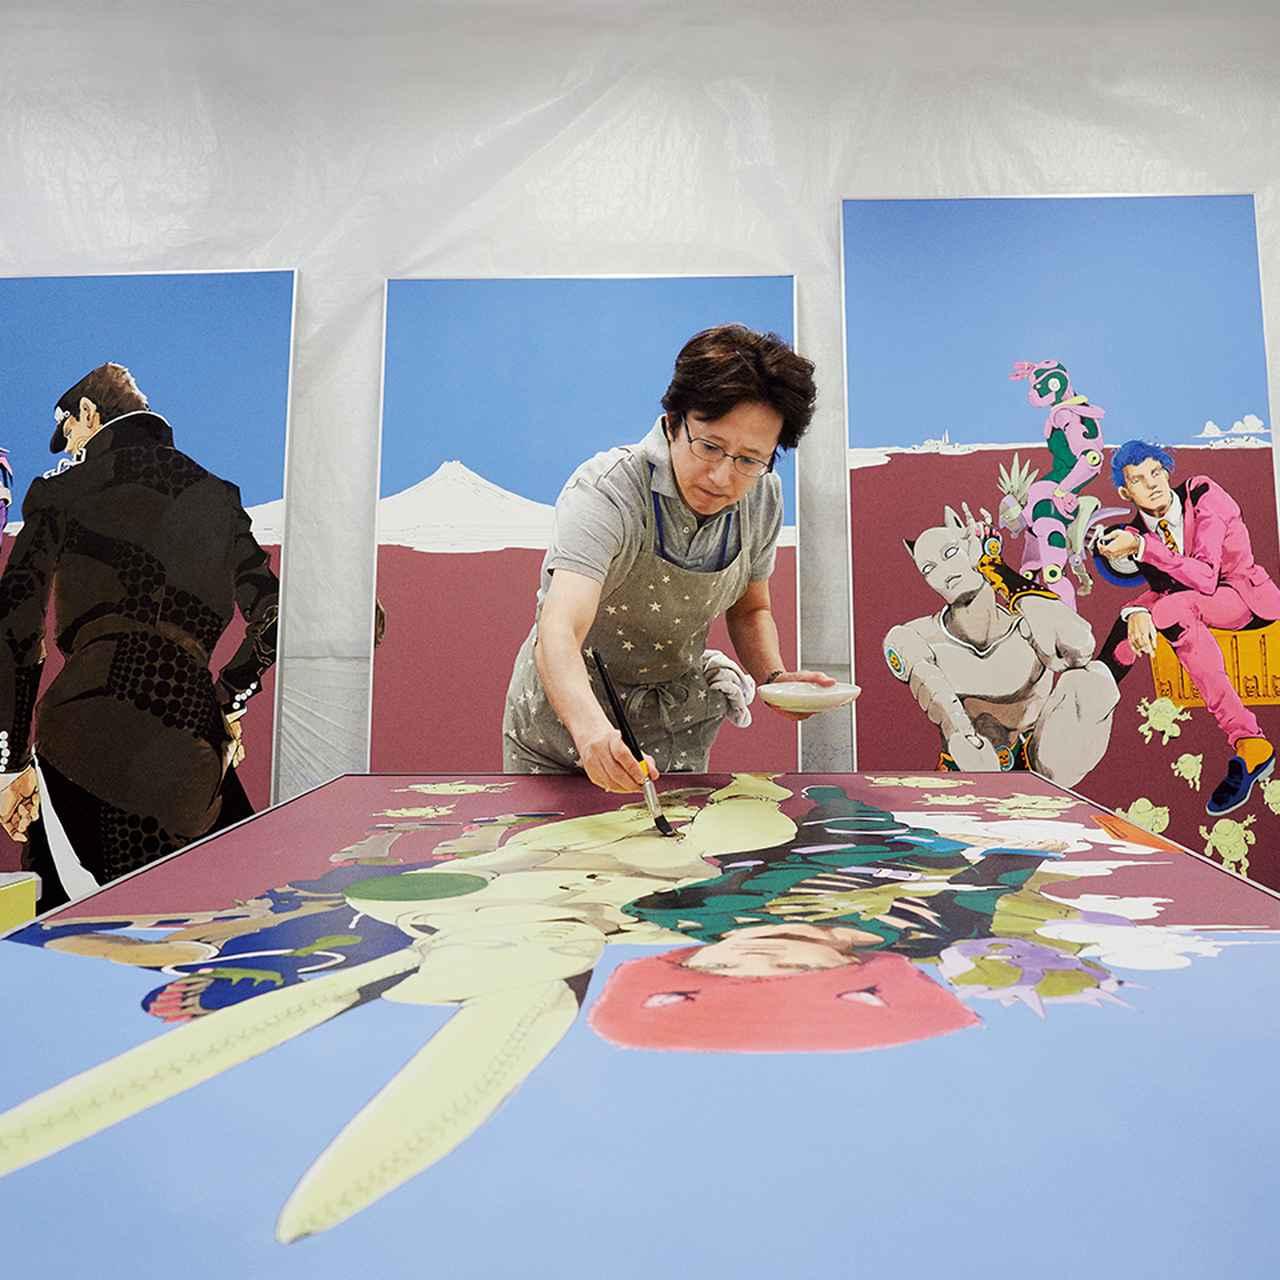 Images : 5番目の画像 - 「スペシャル インタビュー 漫画家・荒木飛呂彦の化学反応」のアルバム - T JAPAN:The New York Times Style Magazine 公式サイト